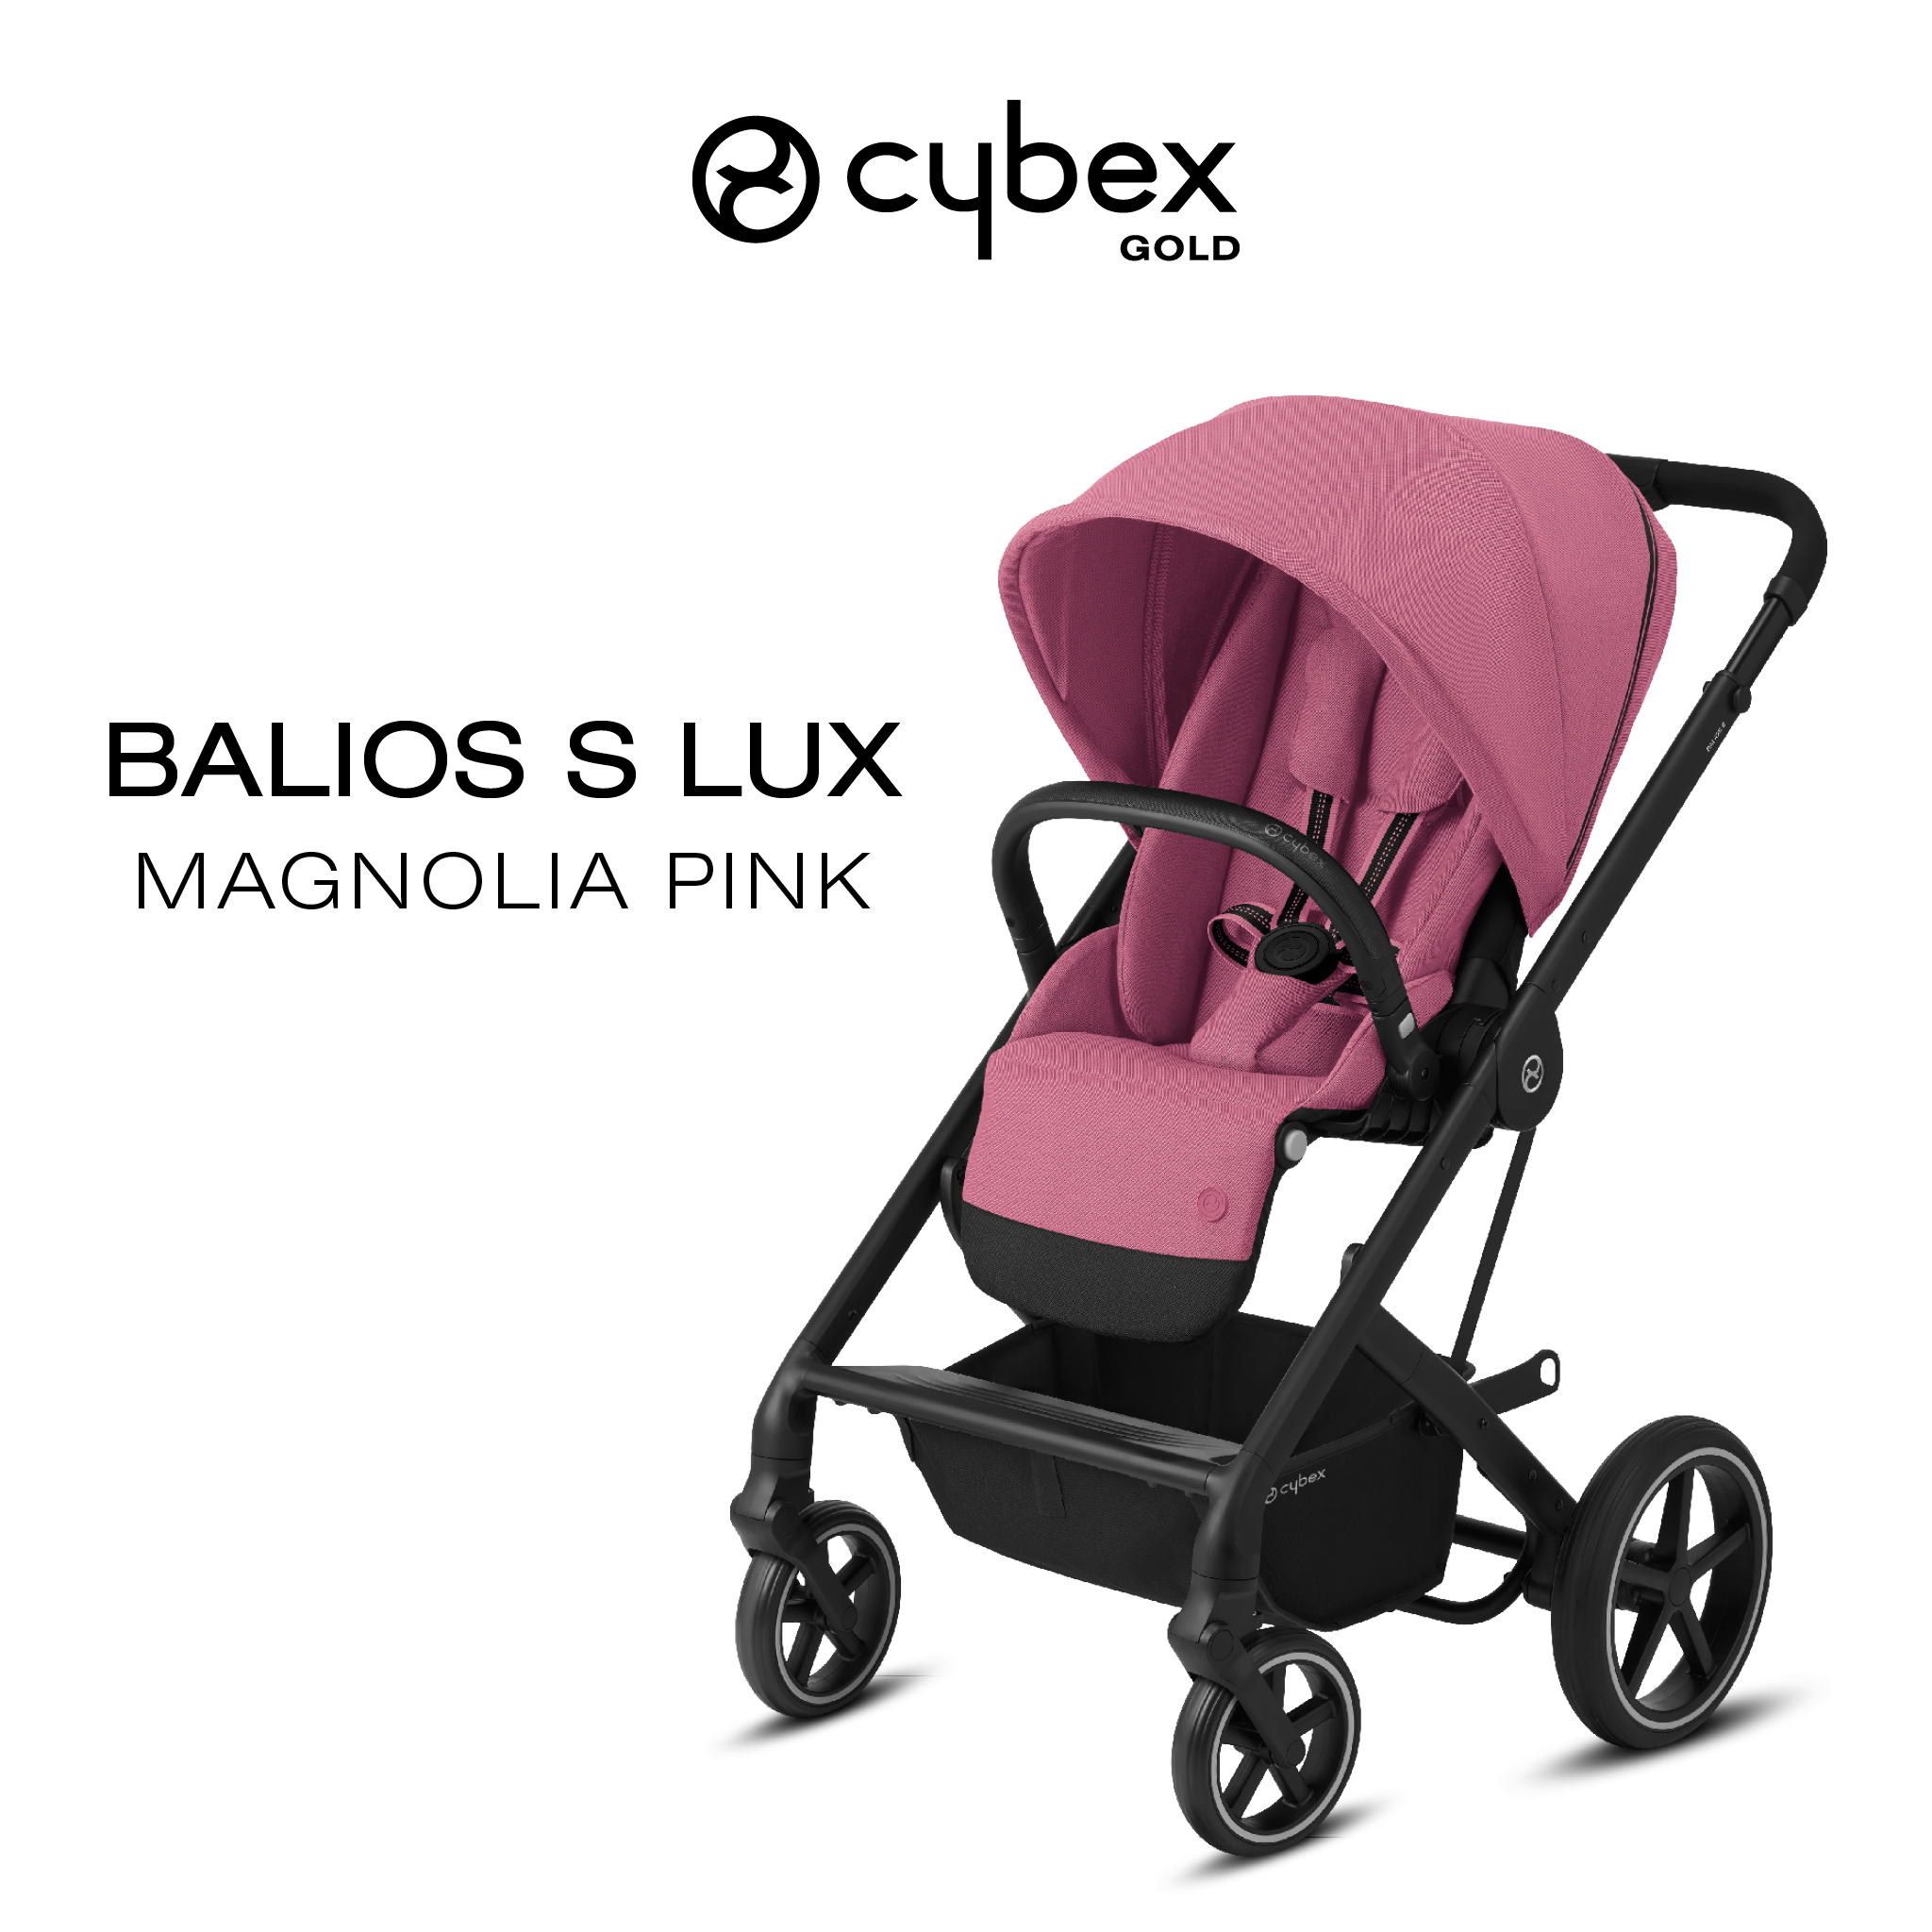 Stroller Black Cybex Balios S Pushchair Buggy Adaptor Clips For Car Seat